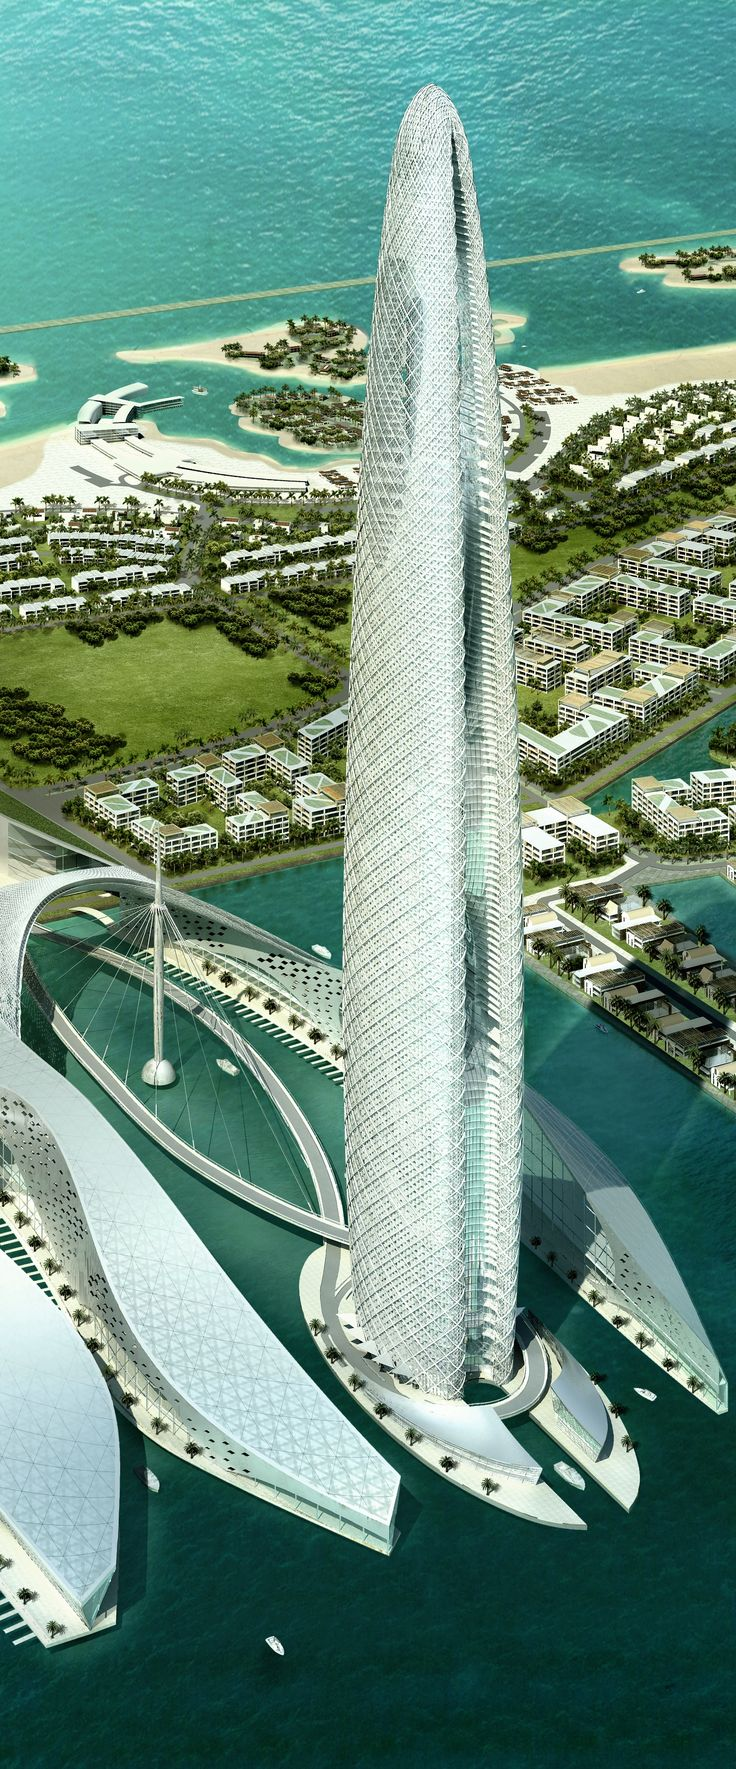 Lulu Island Tower, Abu Dhabi, UAE. designed by Skidmore, Owings & Merrill (SOM) Architects :: 75 floors, height 400m :: vision #Architects #Construction #Architecture  http://www.arcon.pk/complete-solution